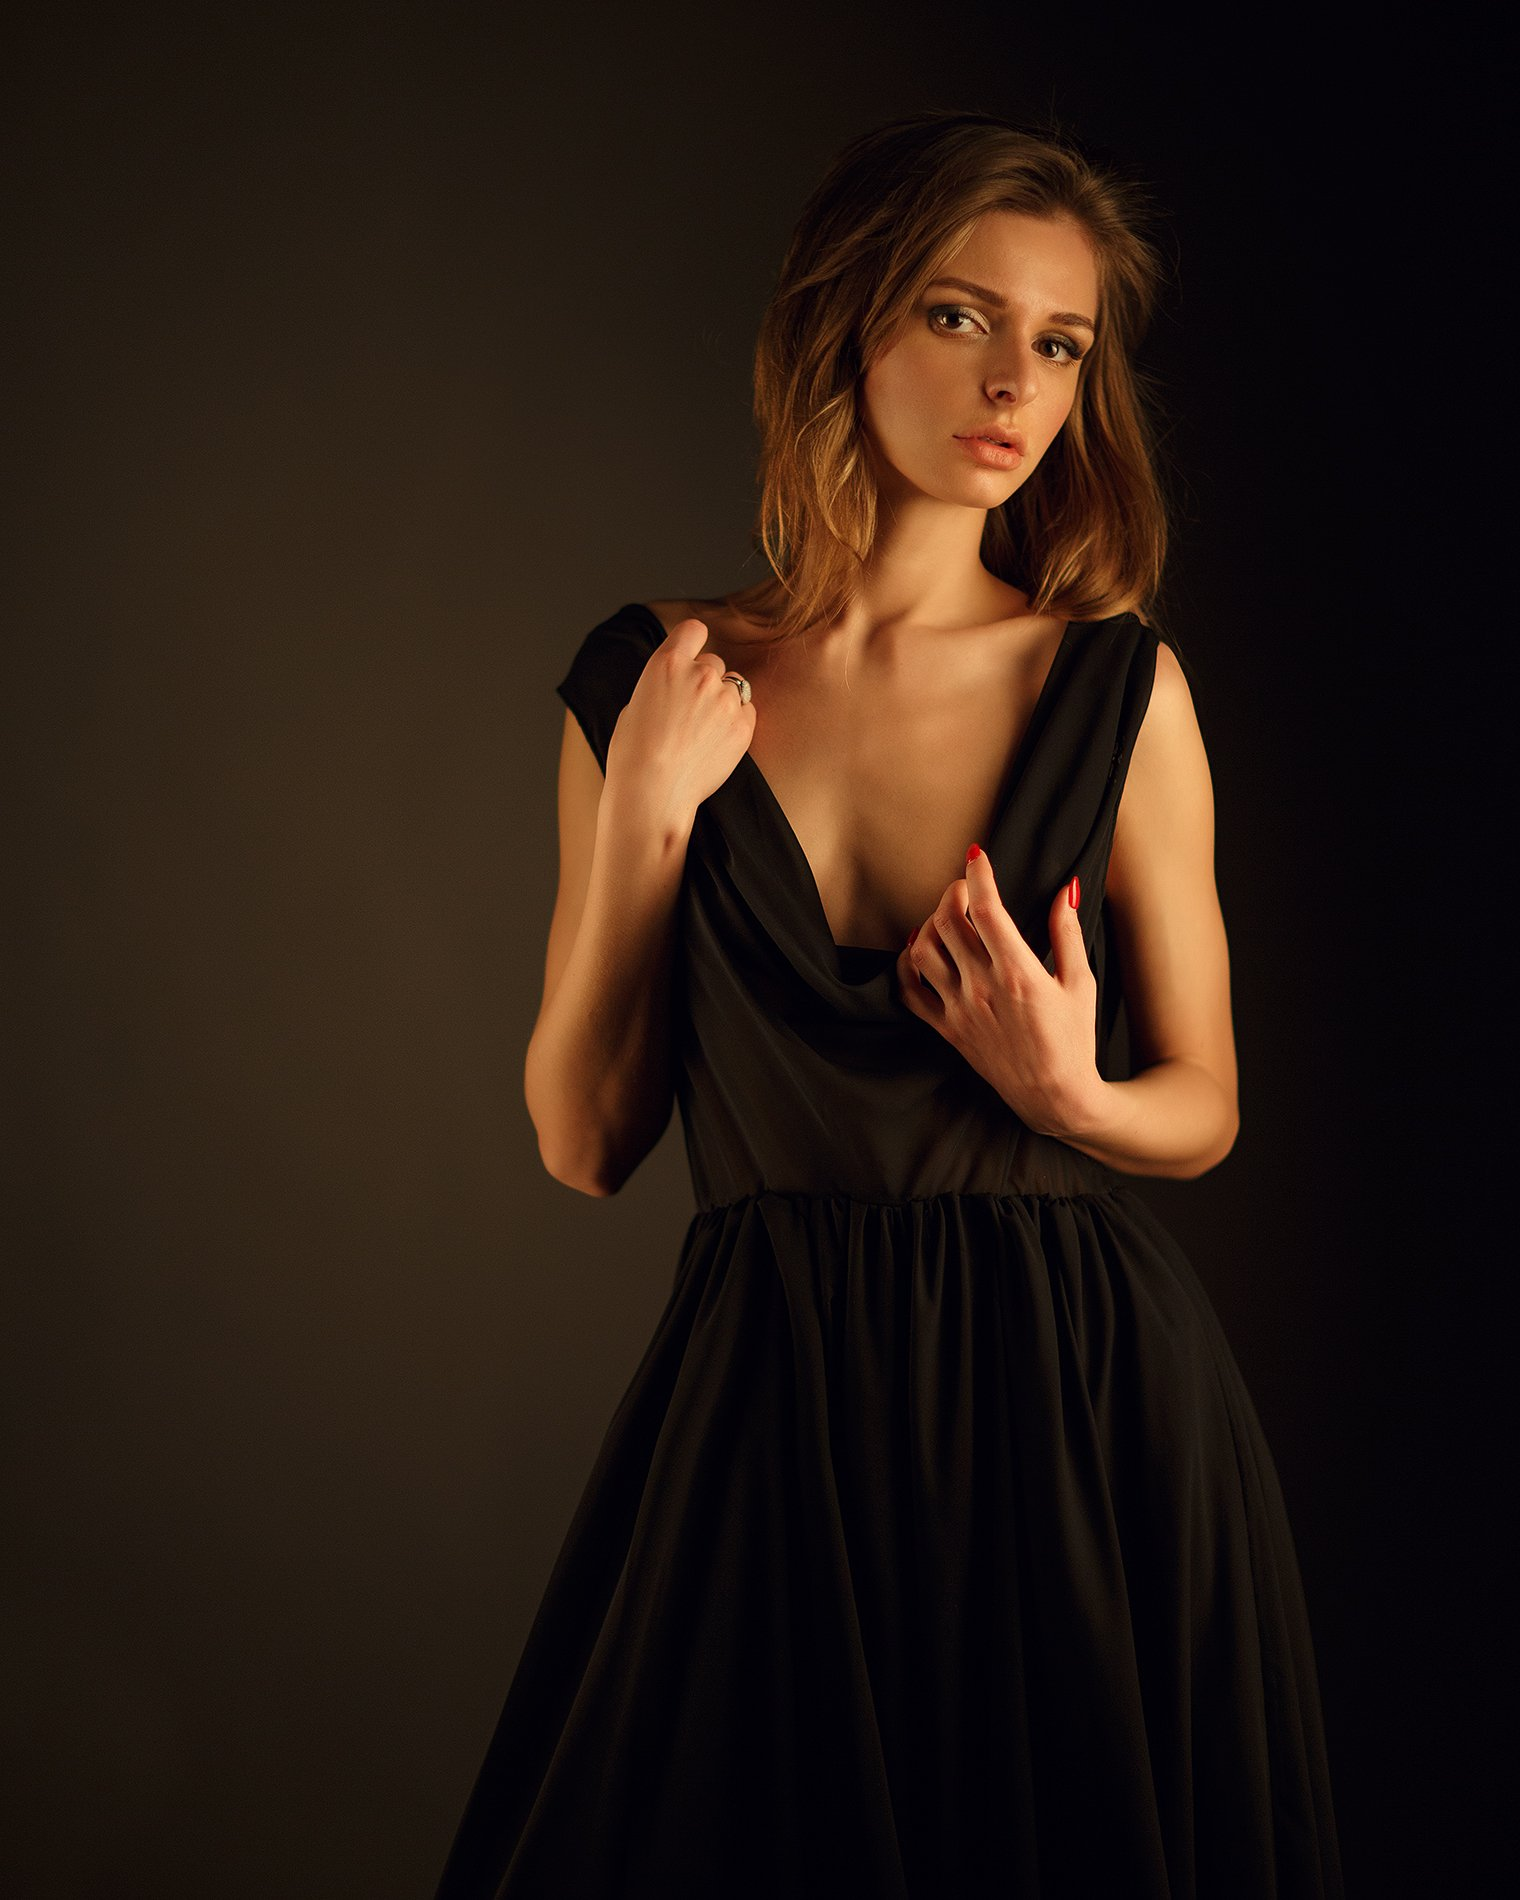 Portrait, girl, beauty, Сергей Сорокин